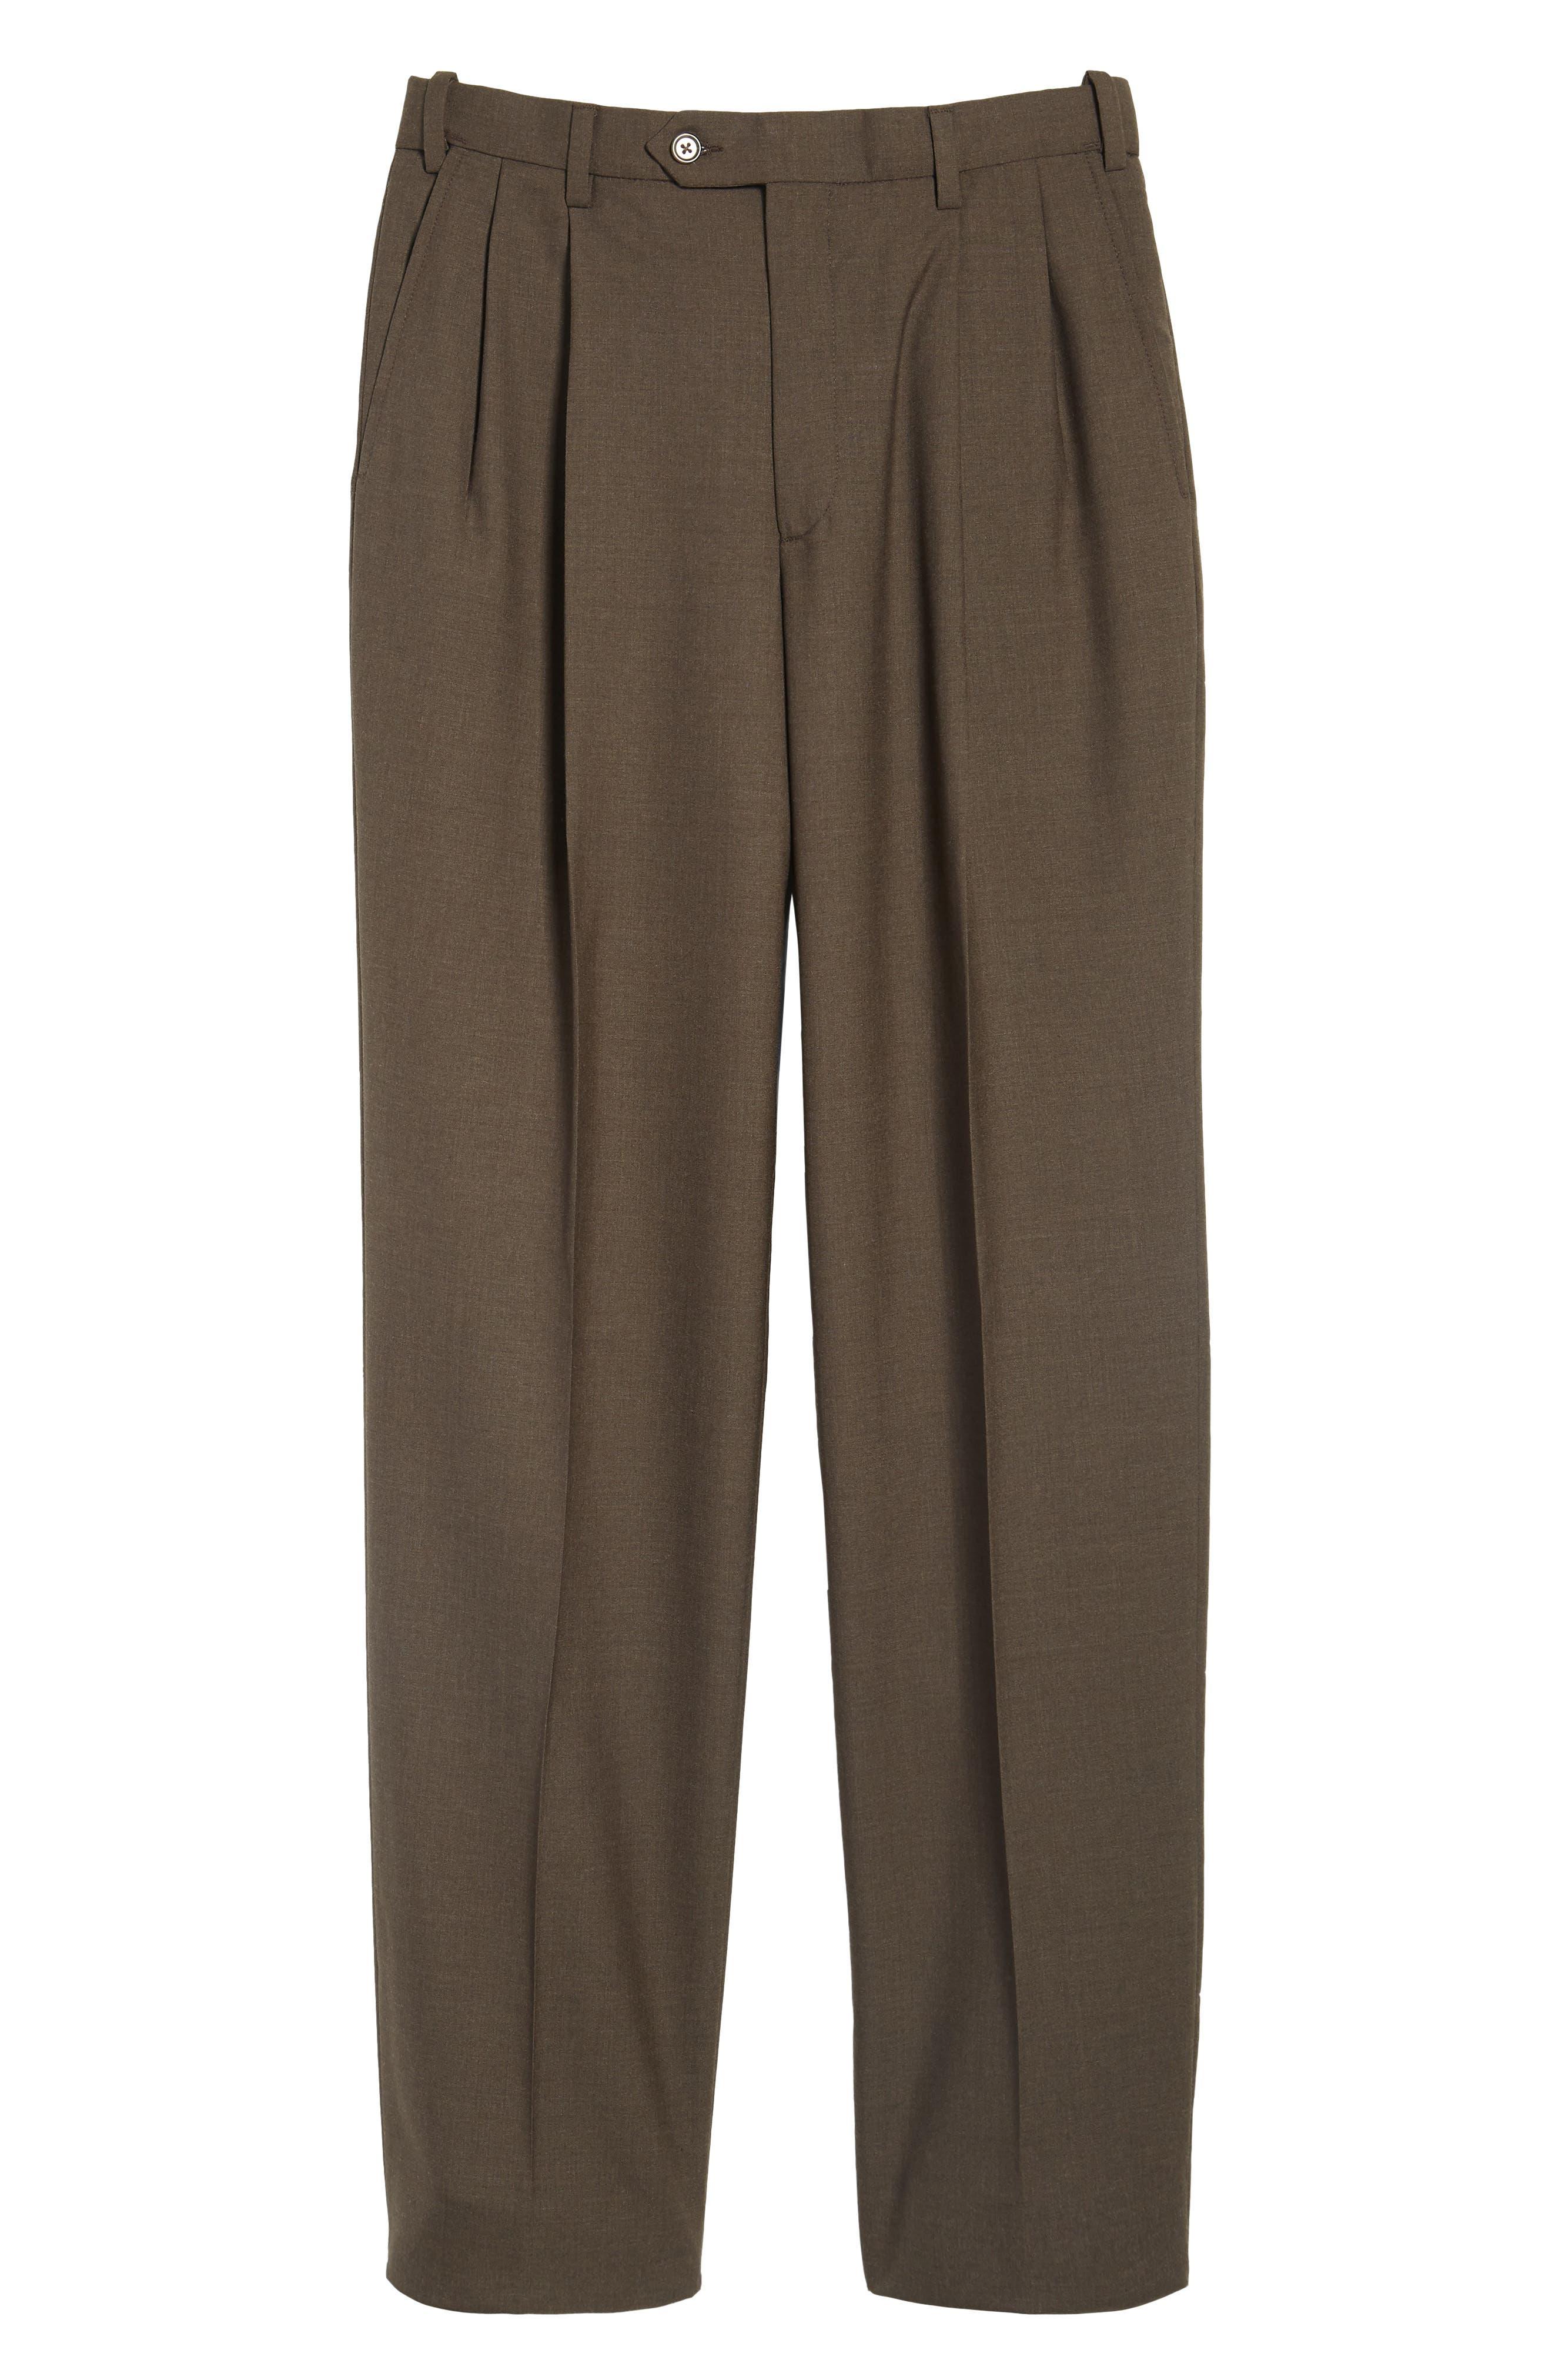 Self Sizer Waist Pleated Wool Gabardine Trousers,                             Alternate thumbnail 6, color,                             BROWN